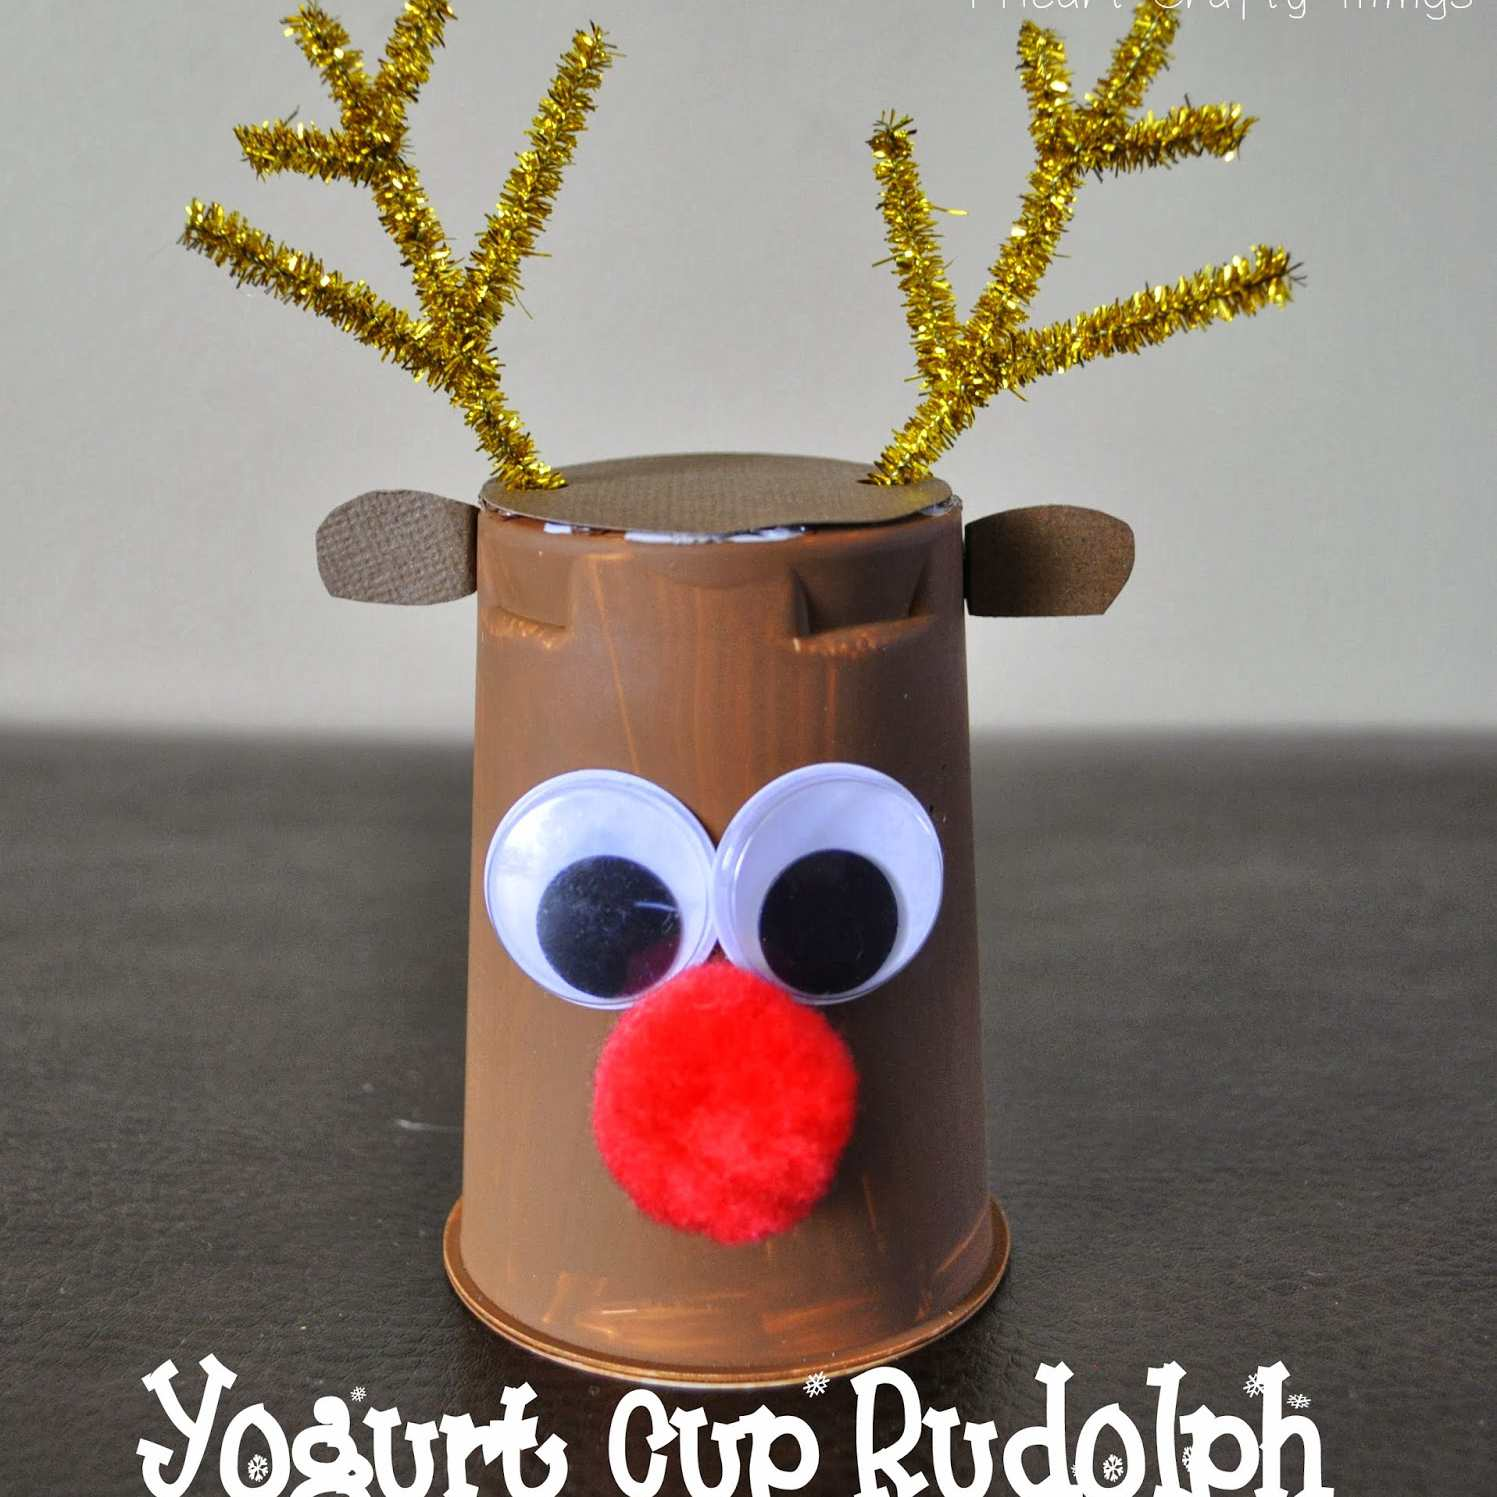 Yogurt Cup Rudolph